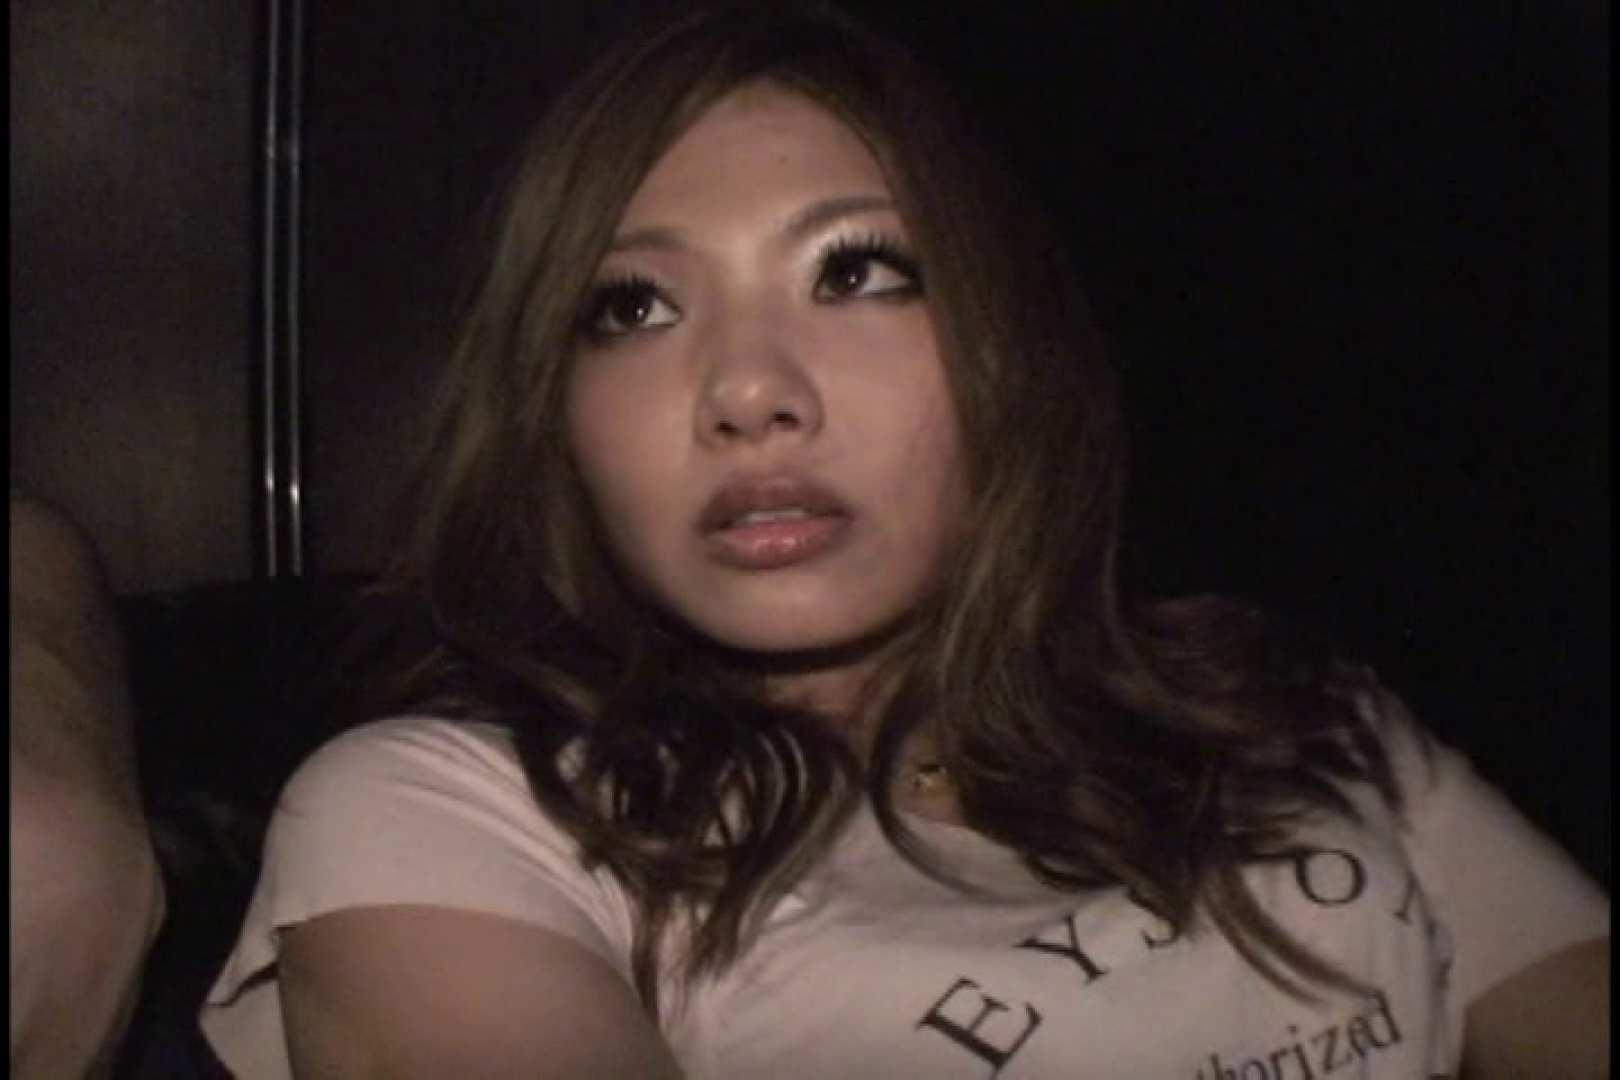 JDハンター全国ツアー vol.047 後編 超エロ女子大生  110枚 34